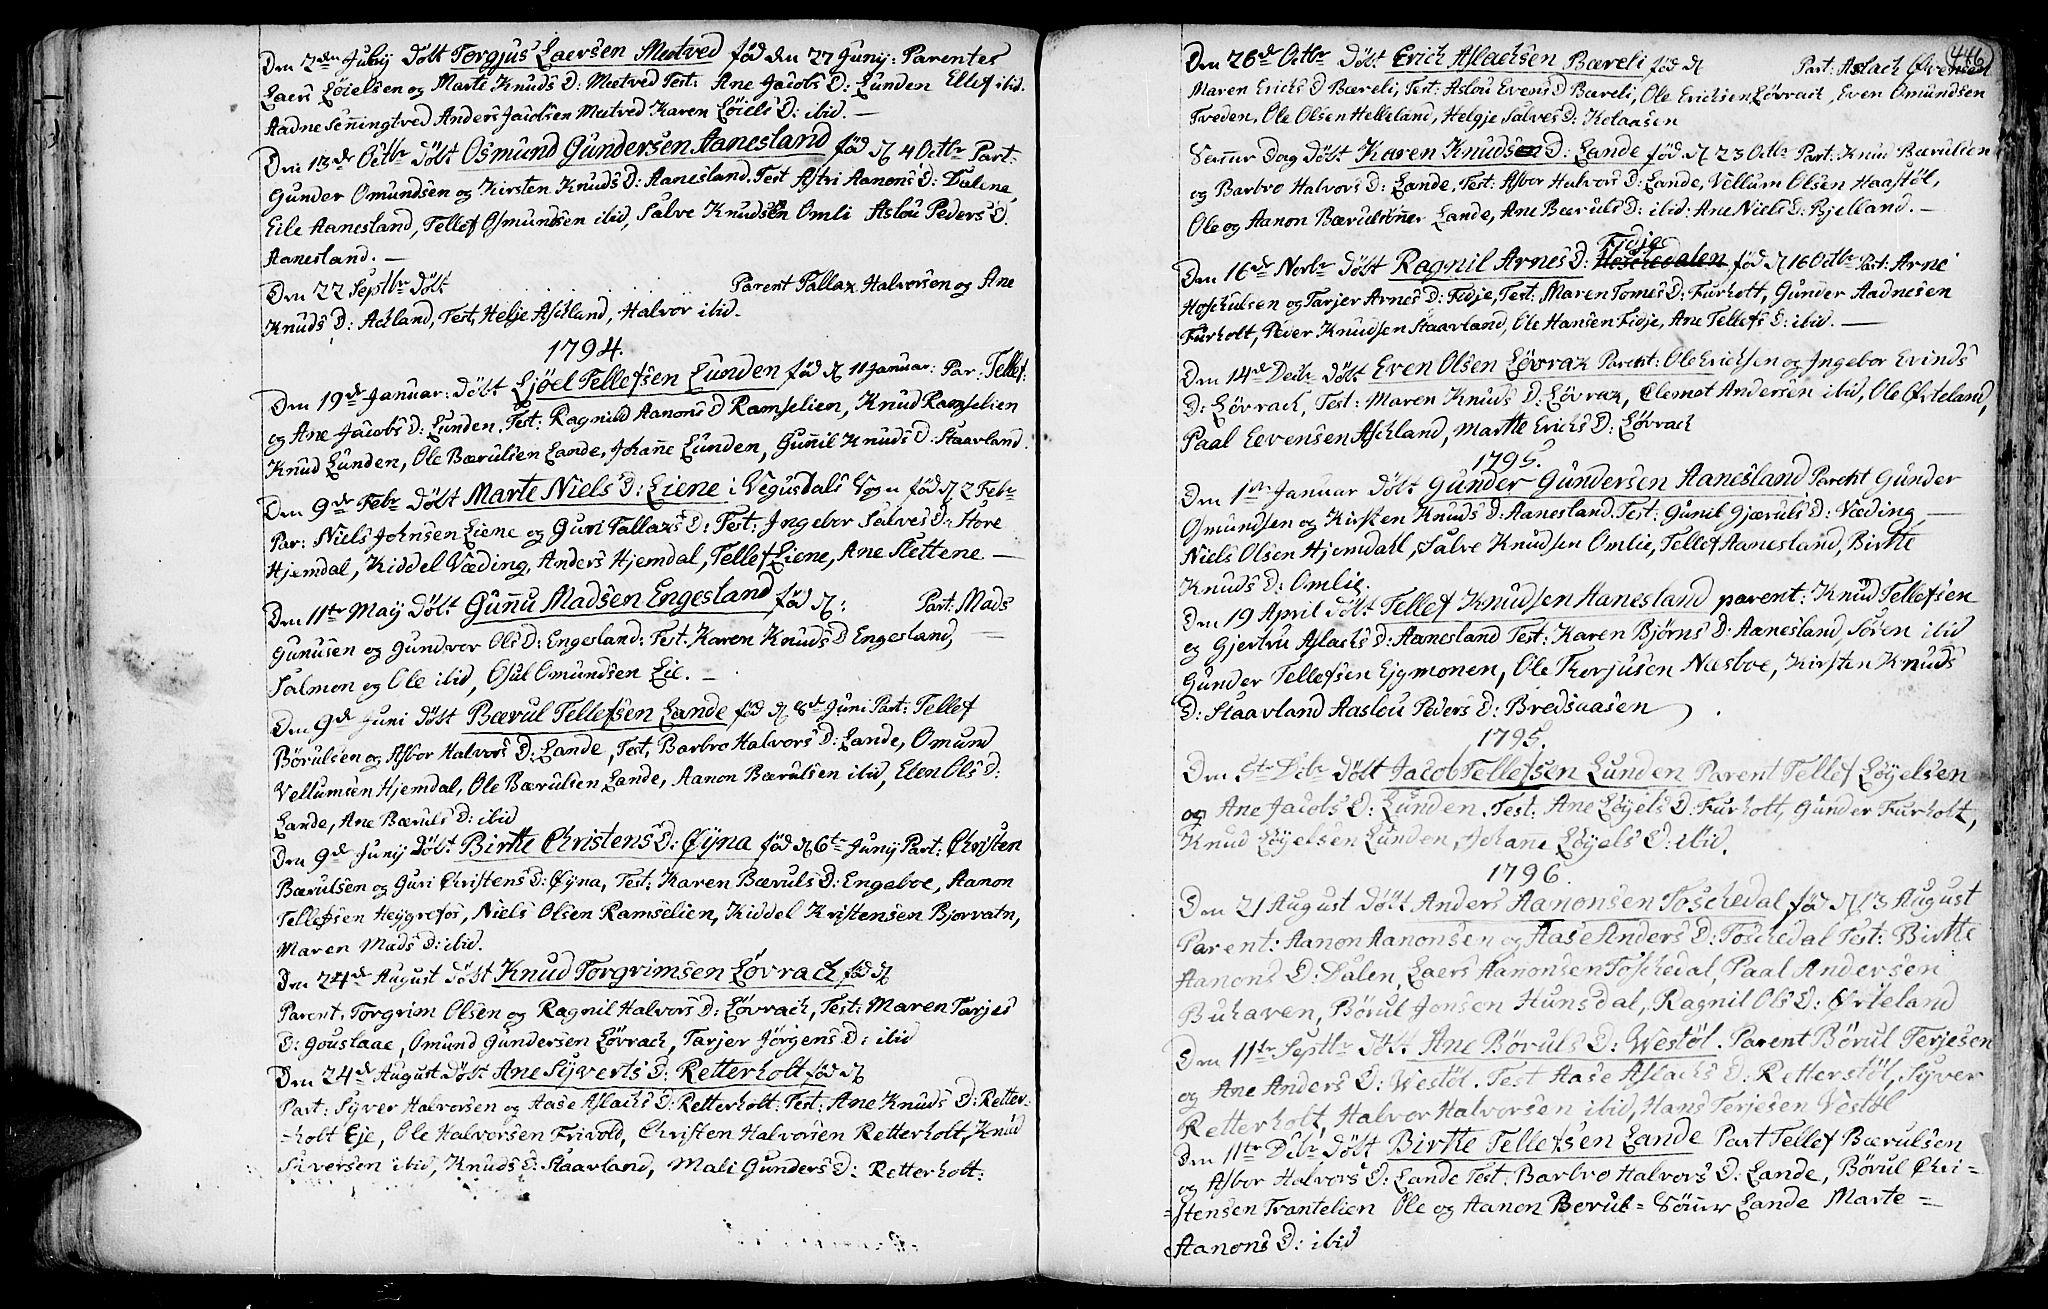 SAK, Hommedal sokneprestkontor, F/Fa/Fab/L0002: Ministerialbok nr. A 2 /3, 1740-1821, s. 446